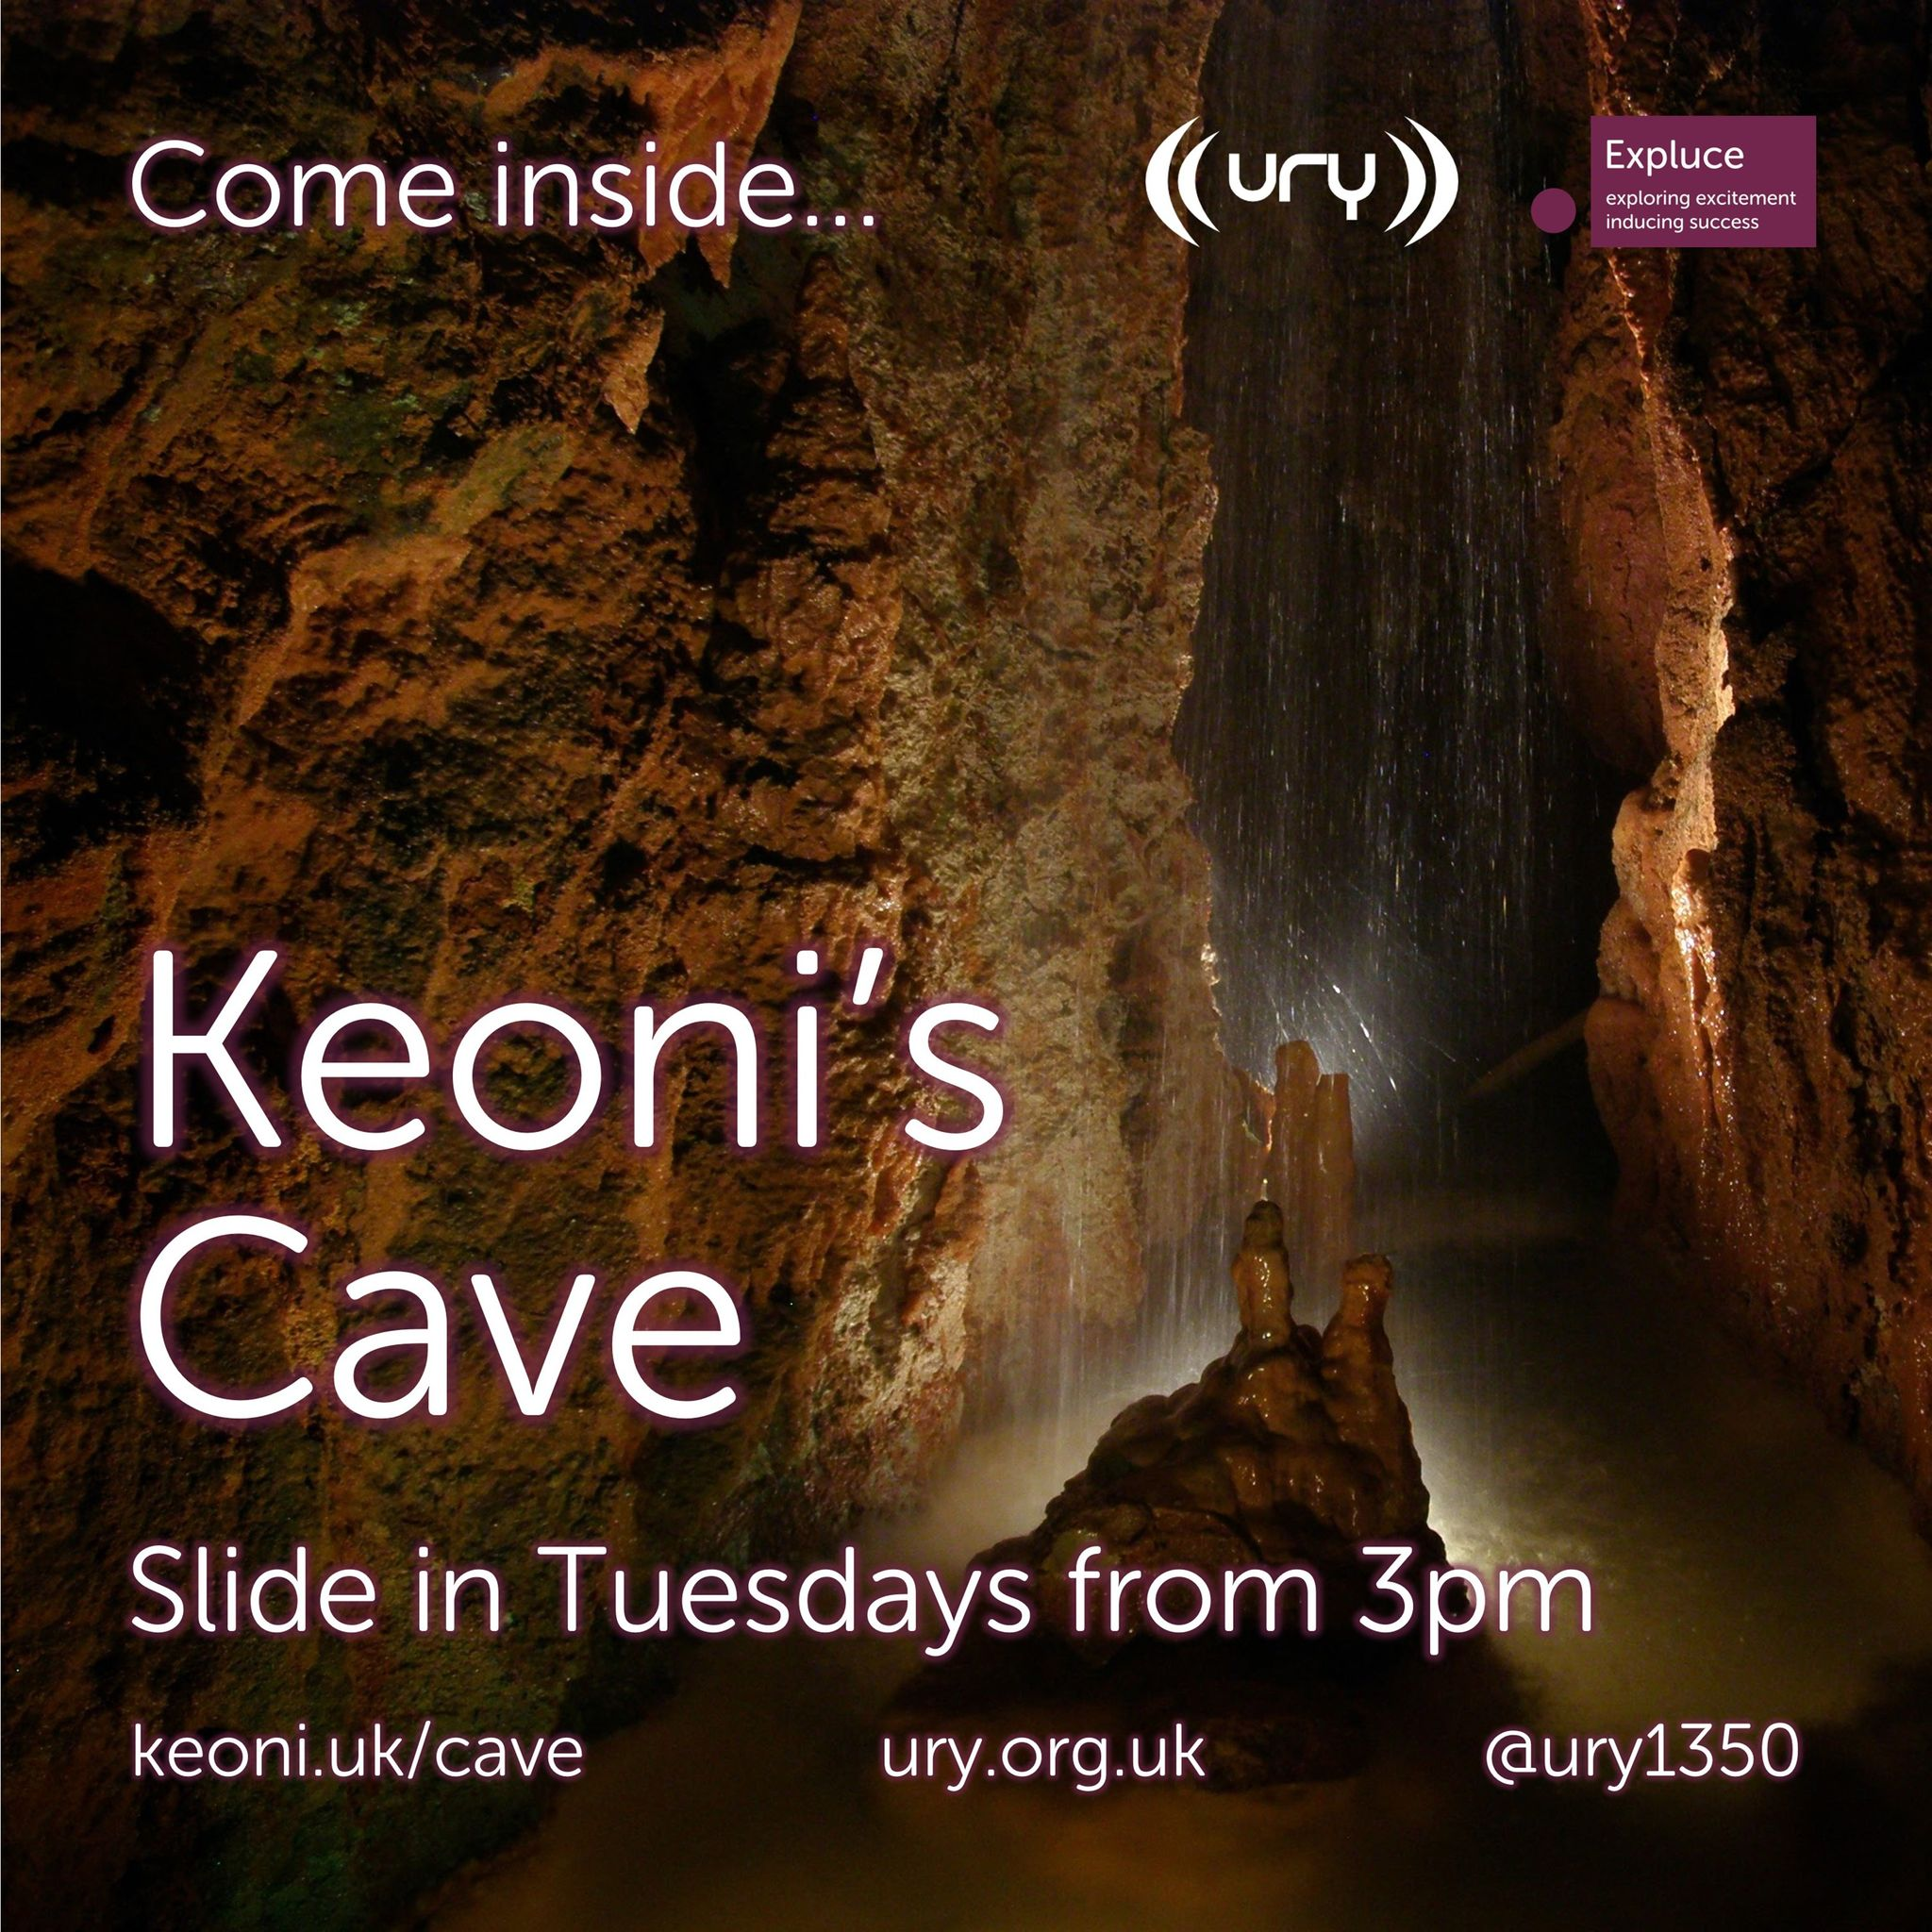 Keoni's Cave logo.